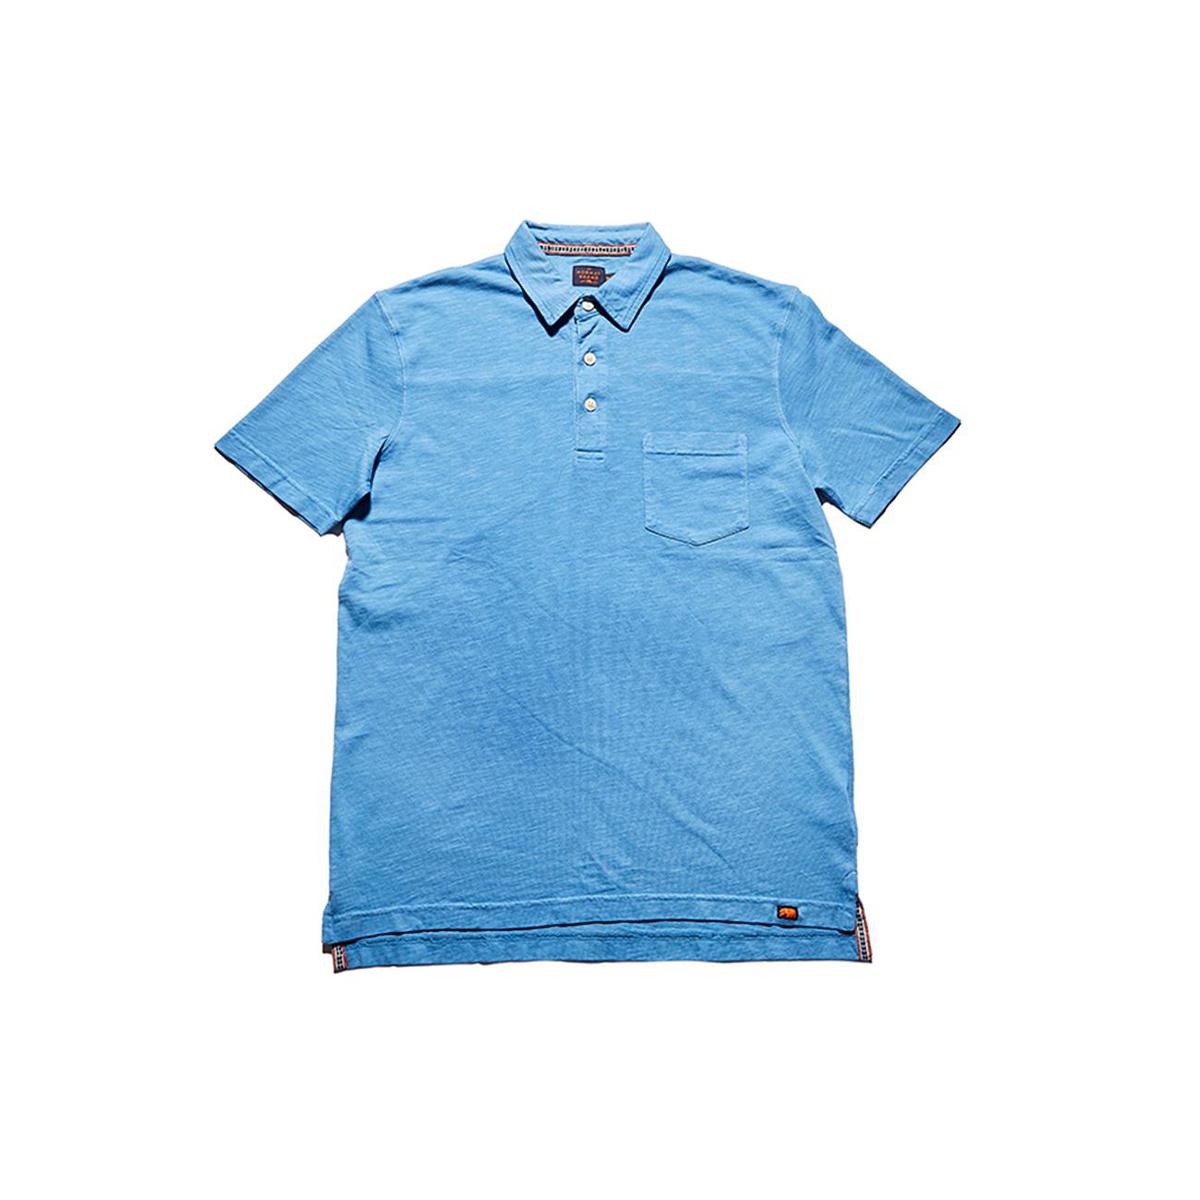 The Normal Brand Men's Slub Short Sleeve Pocket Polo